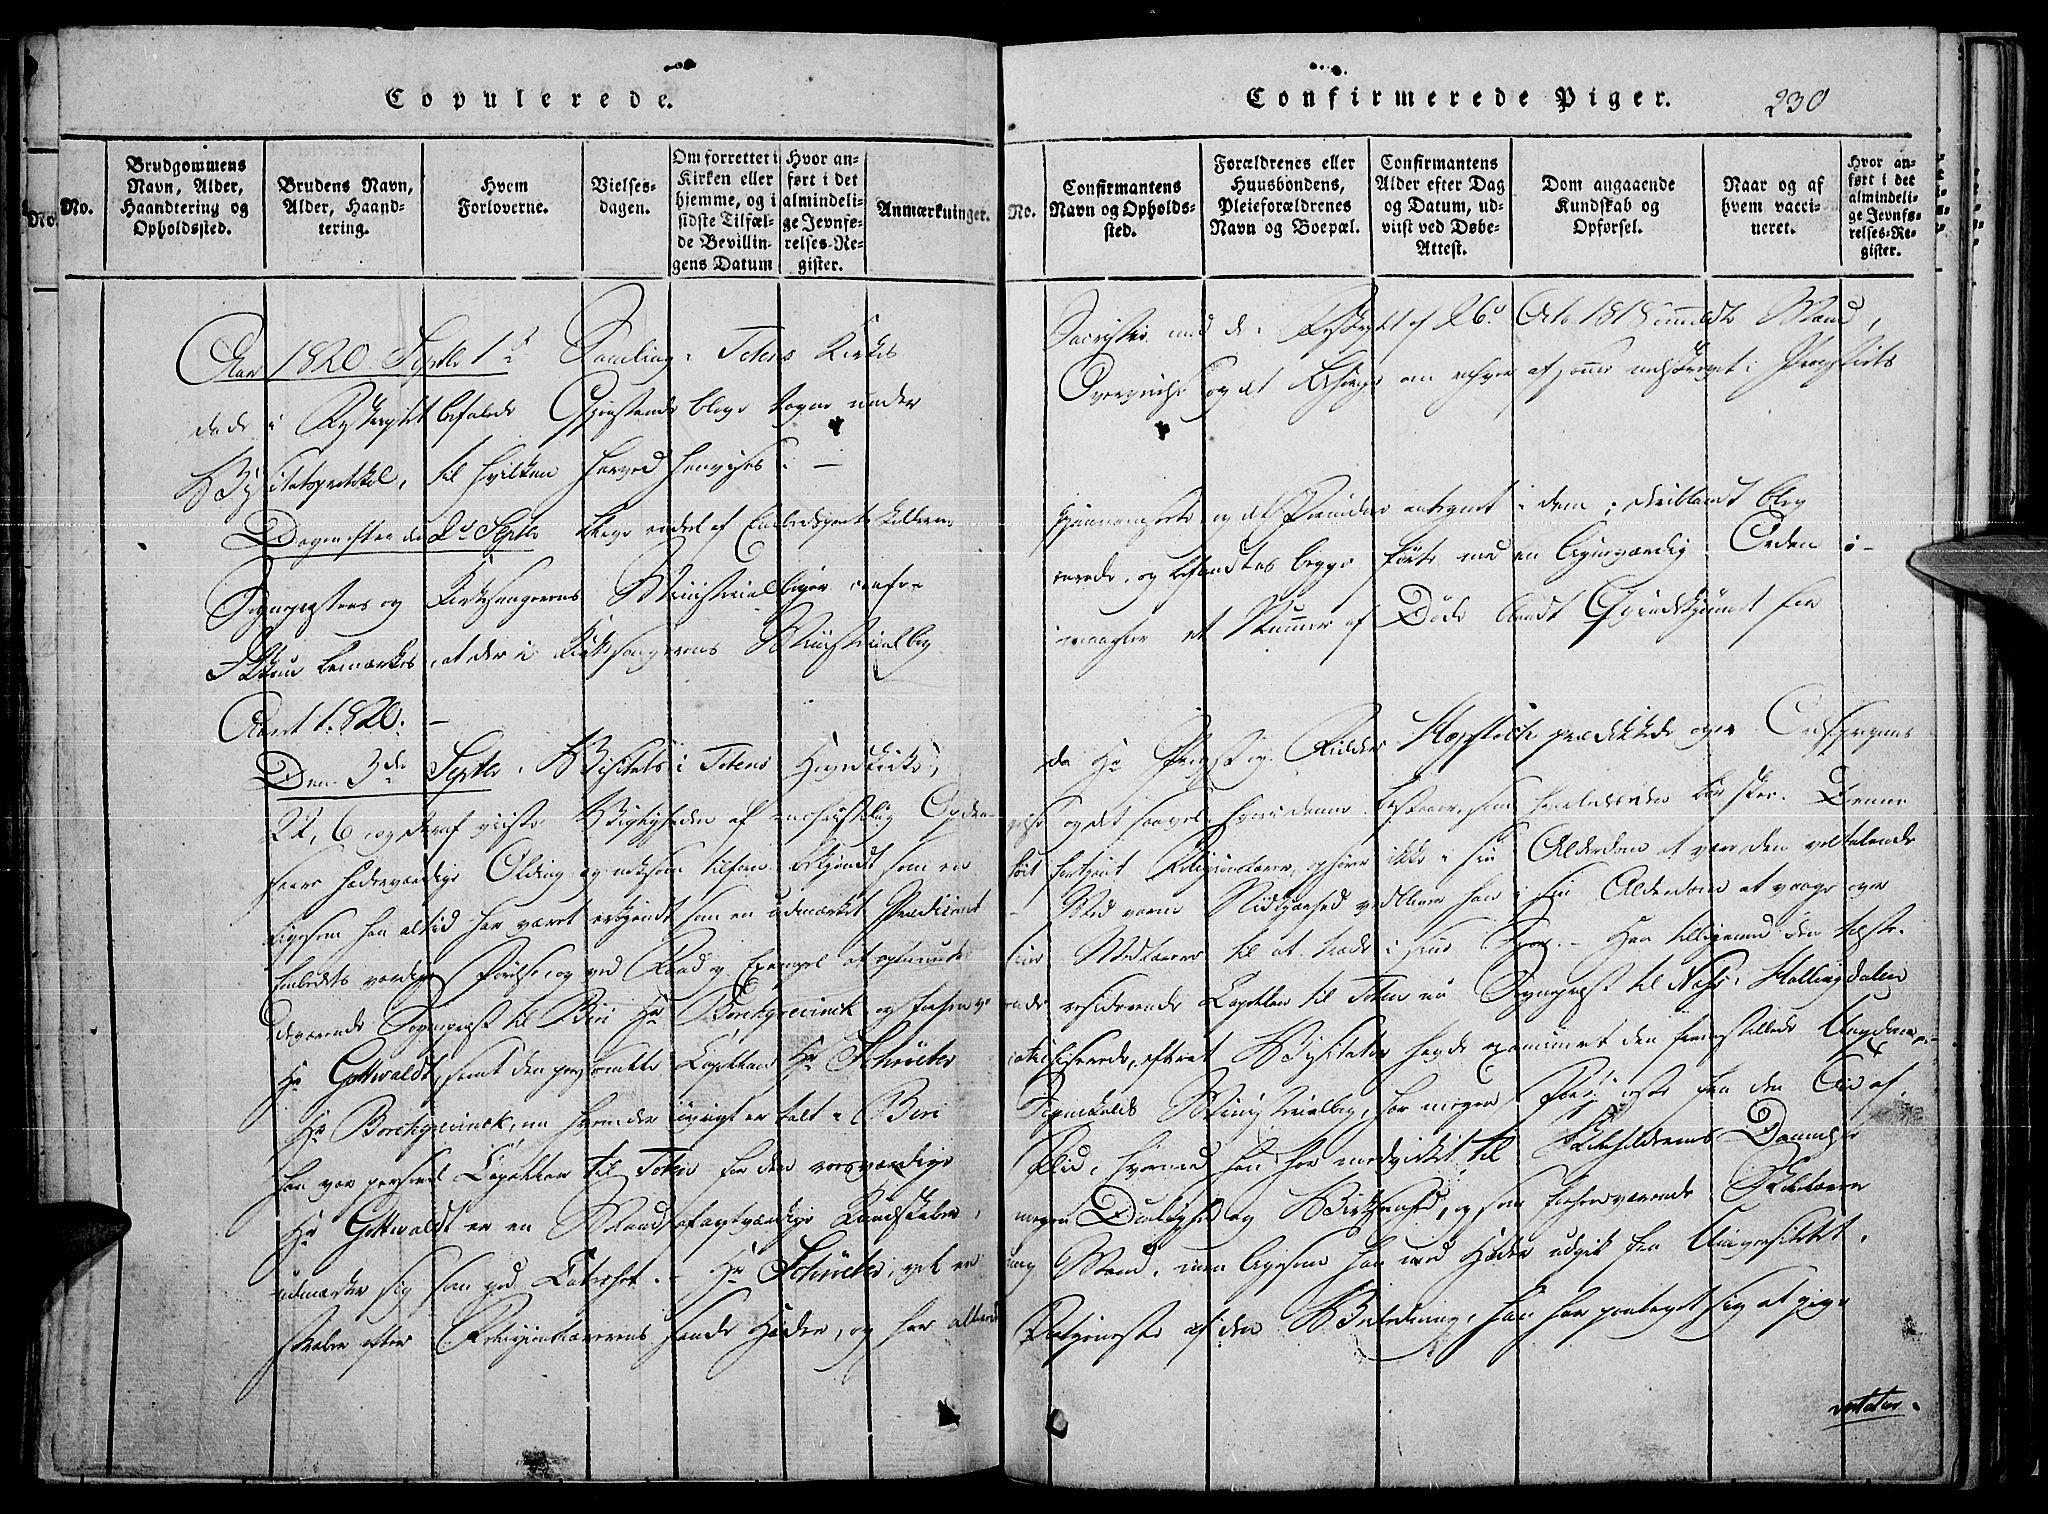 SAH, Toten prestekontor, Ministerialbok nr. 10, 1820-1828, s. 230